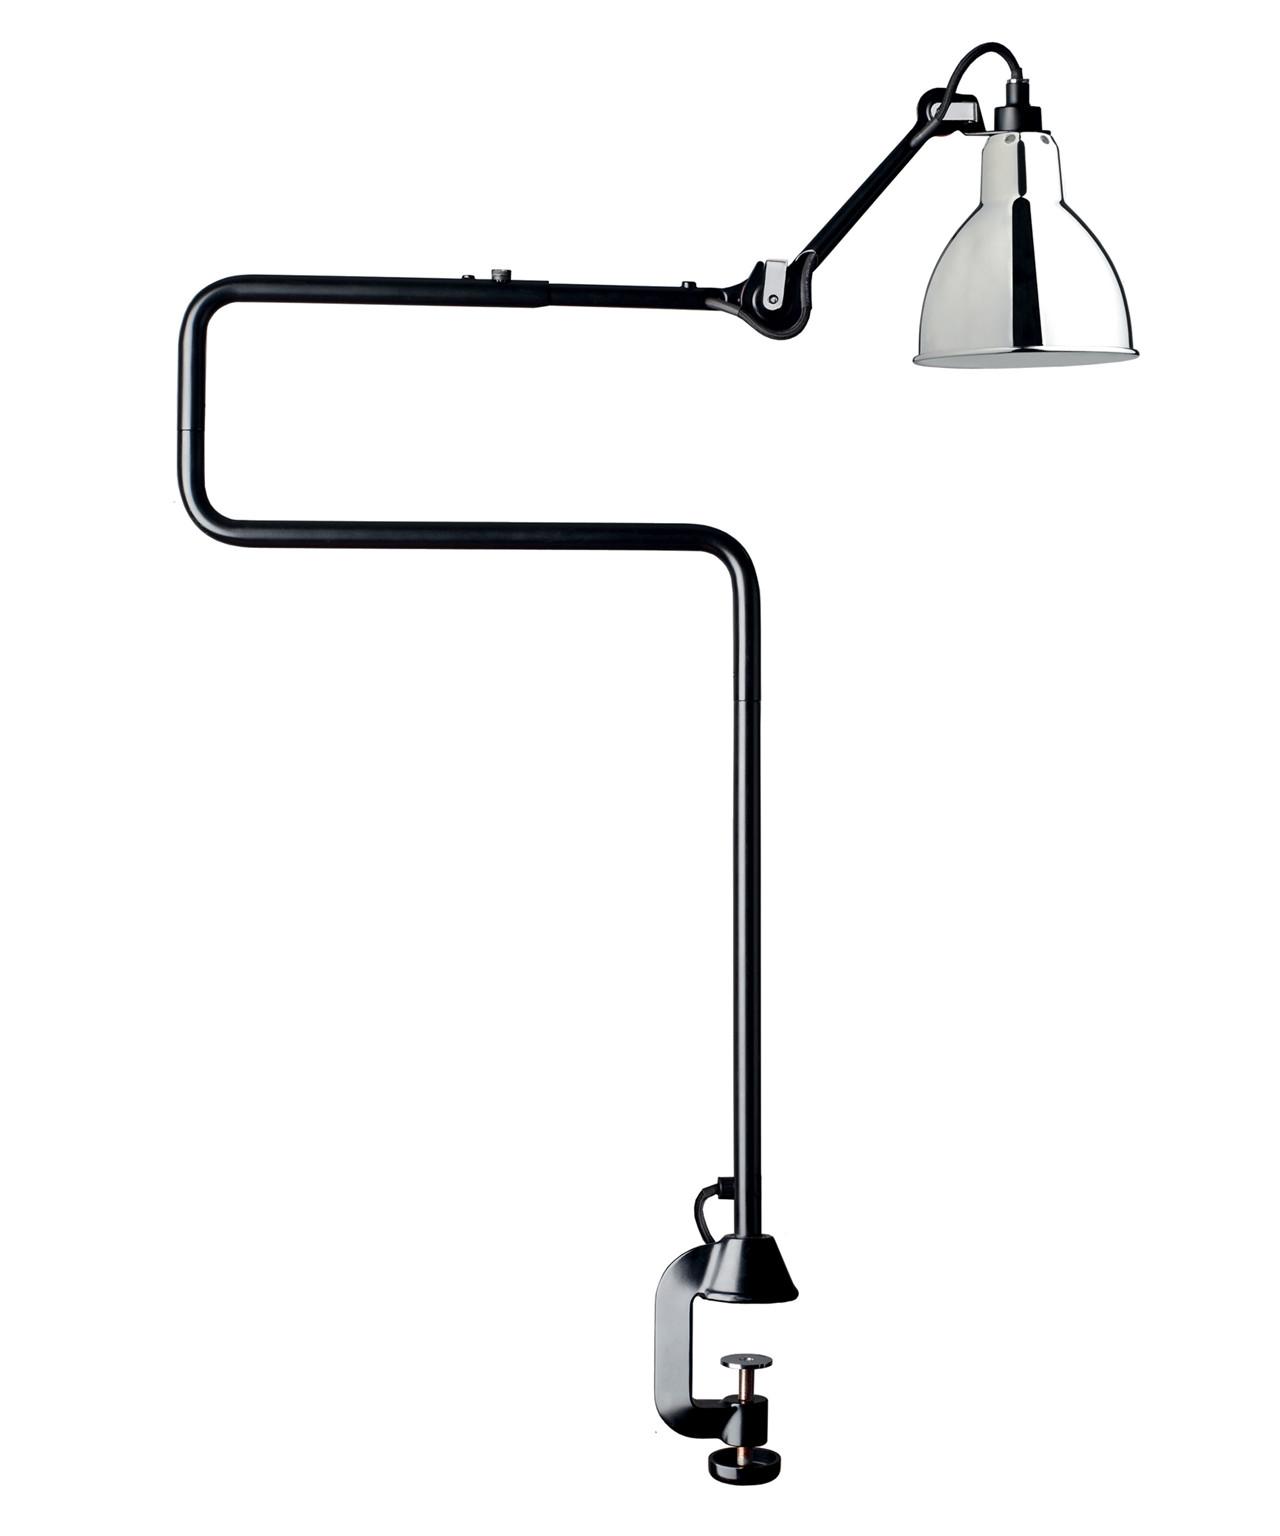 Image of   211-311 Bordlampe Krom - Lampe Gras